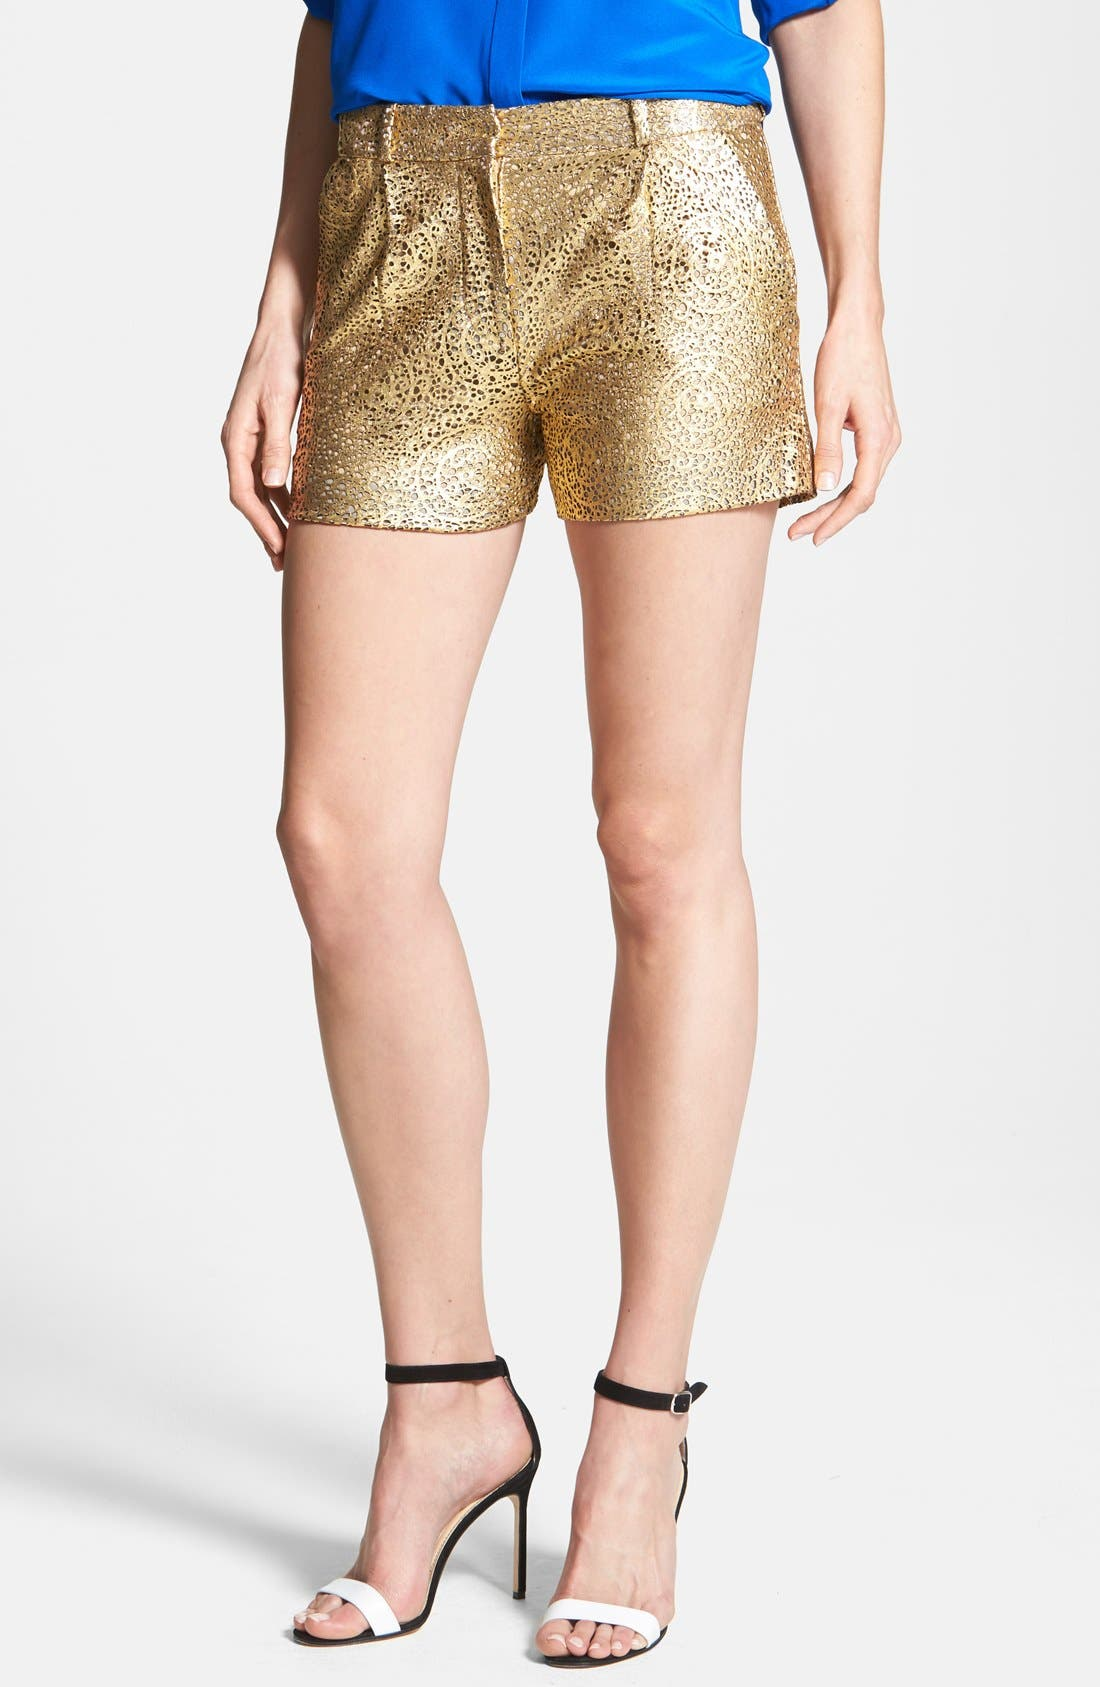 Alternate Image 1 Selected - Diane von Furstenberg 'Naples' Laser Cut Leather Shorts